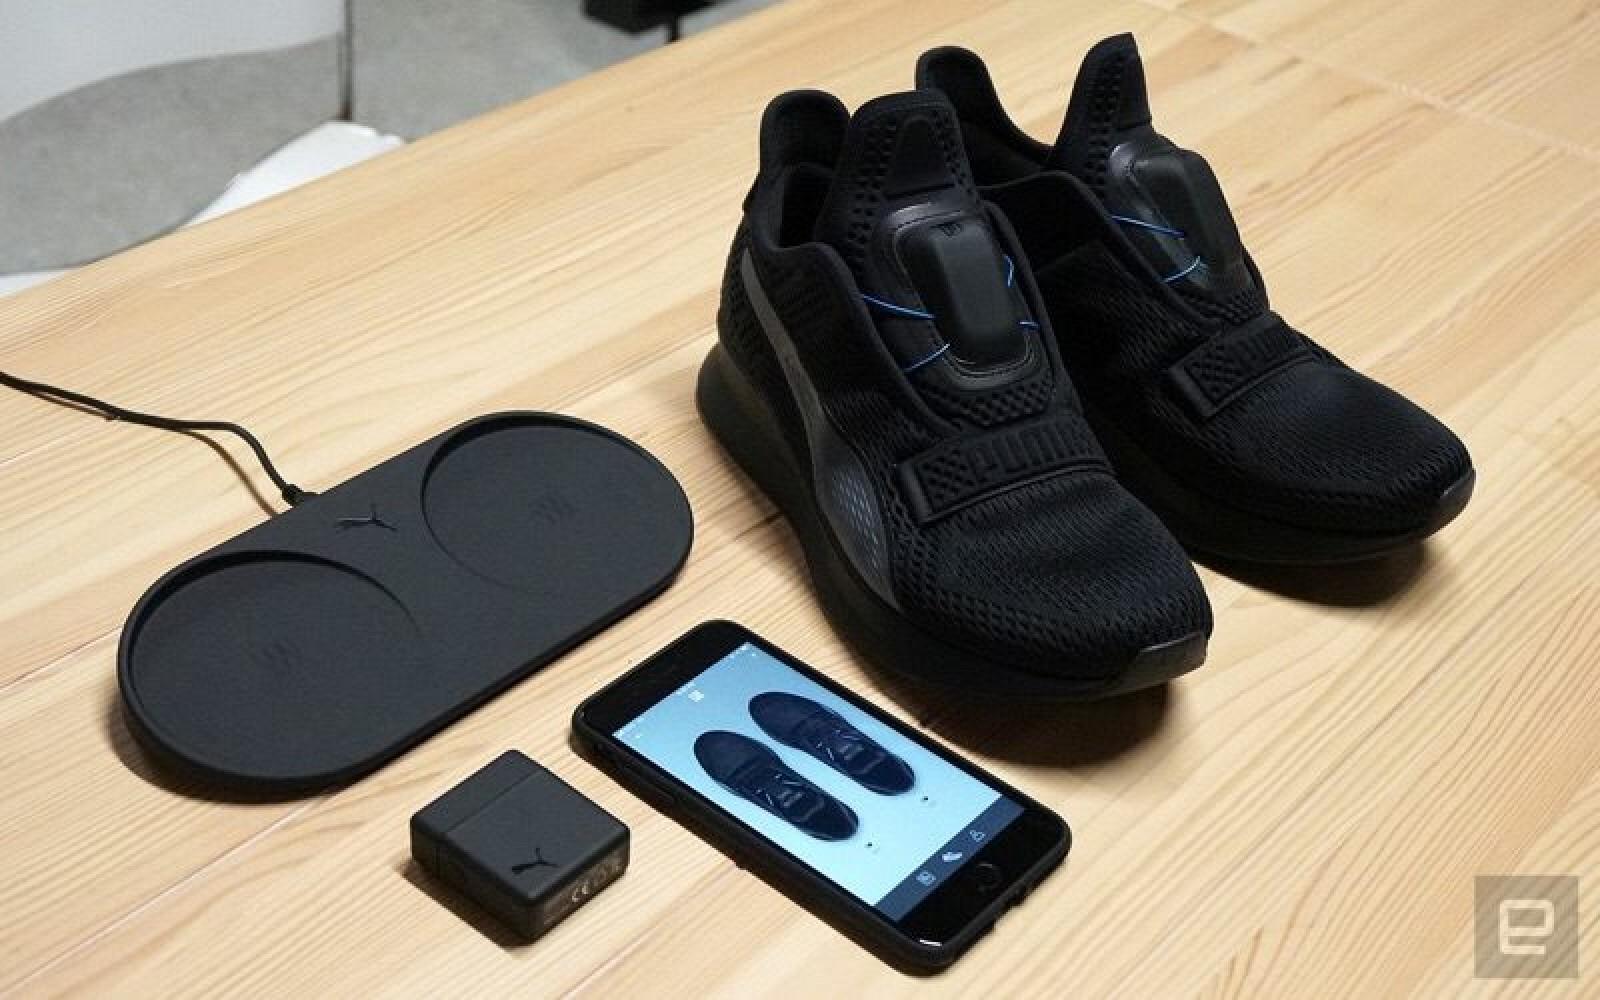 Puma Fi Self Tying Shoes Wireless Charging